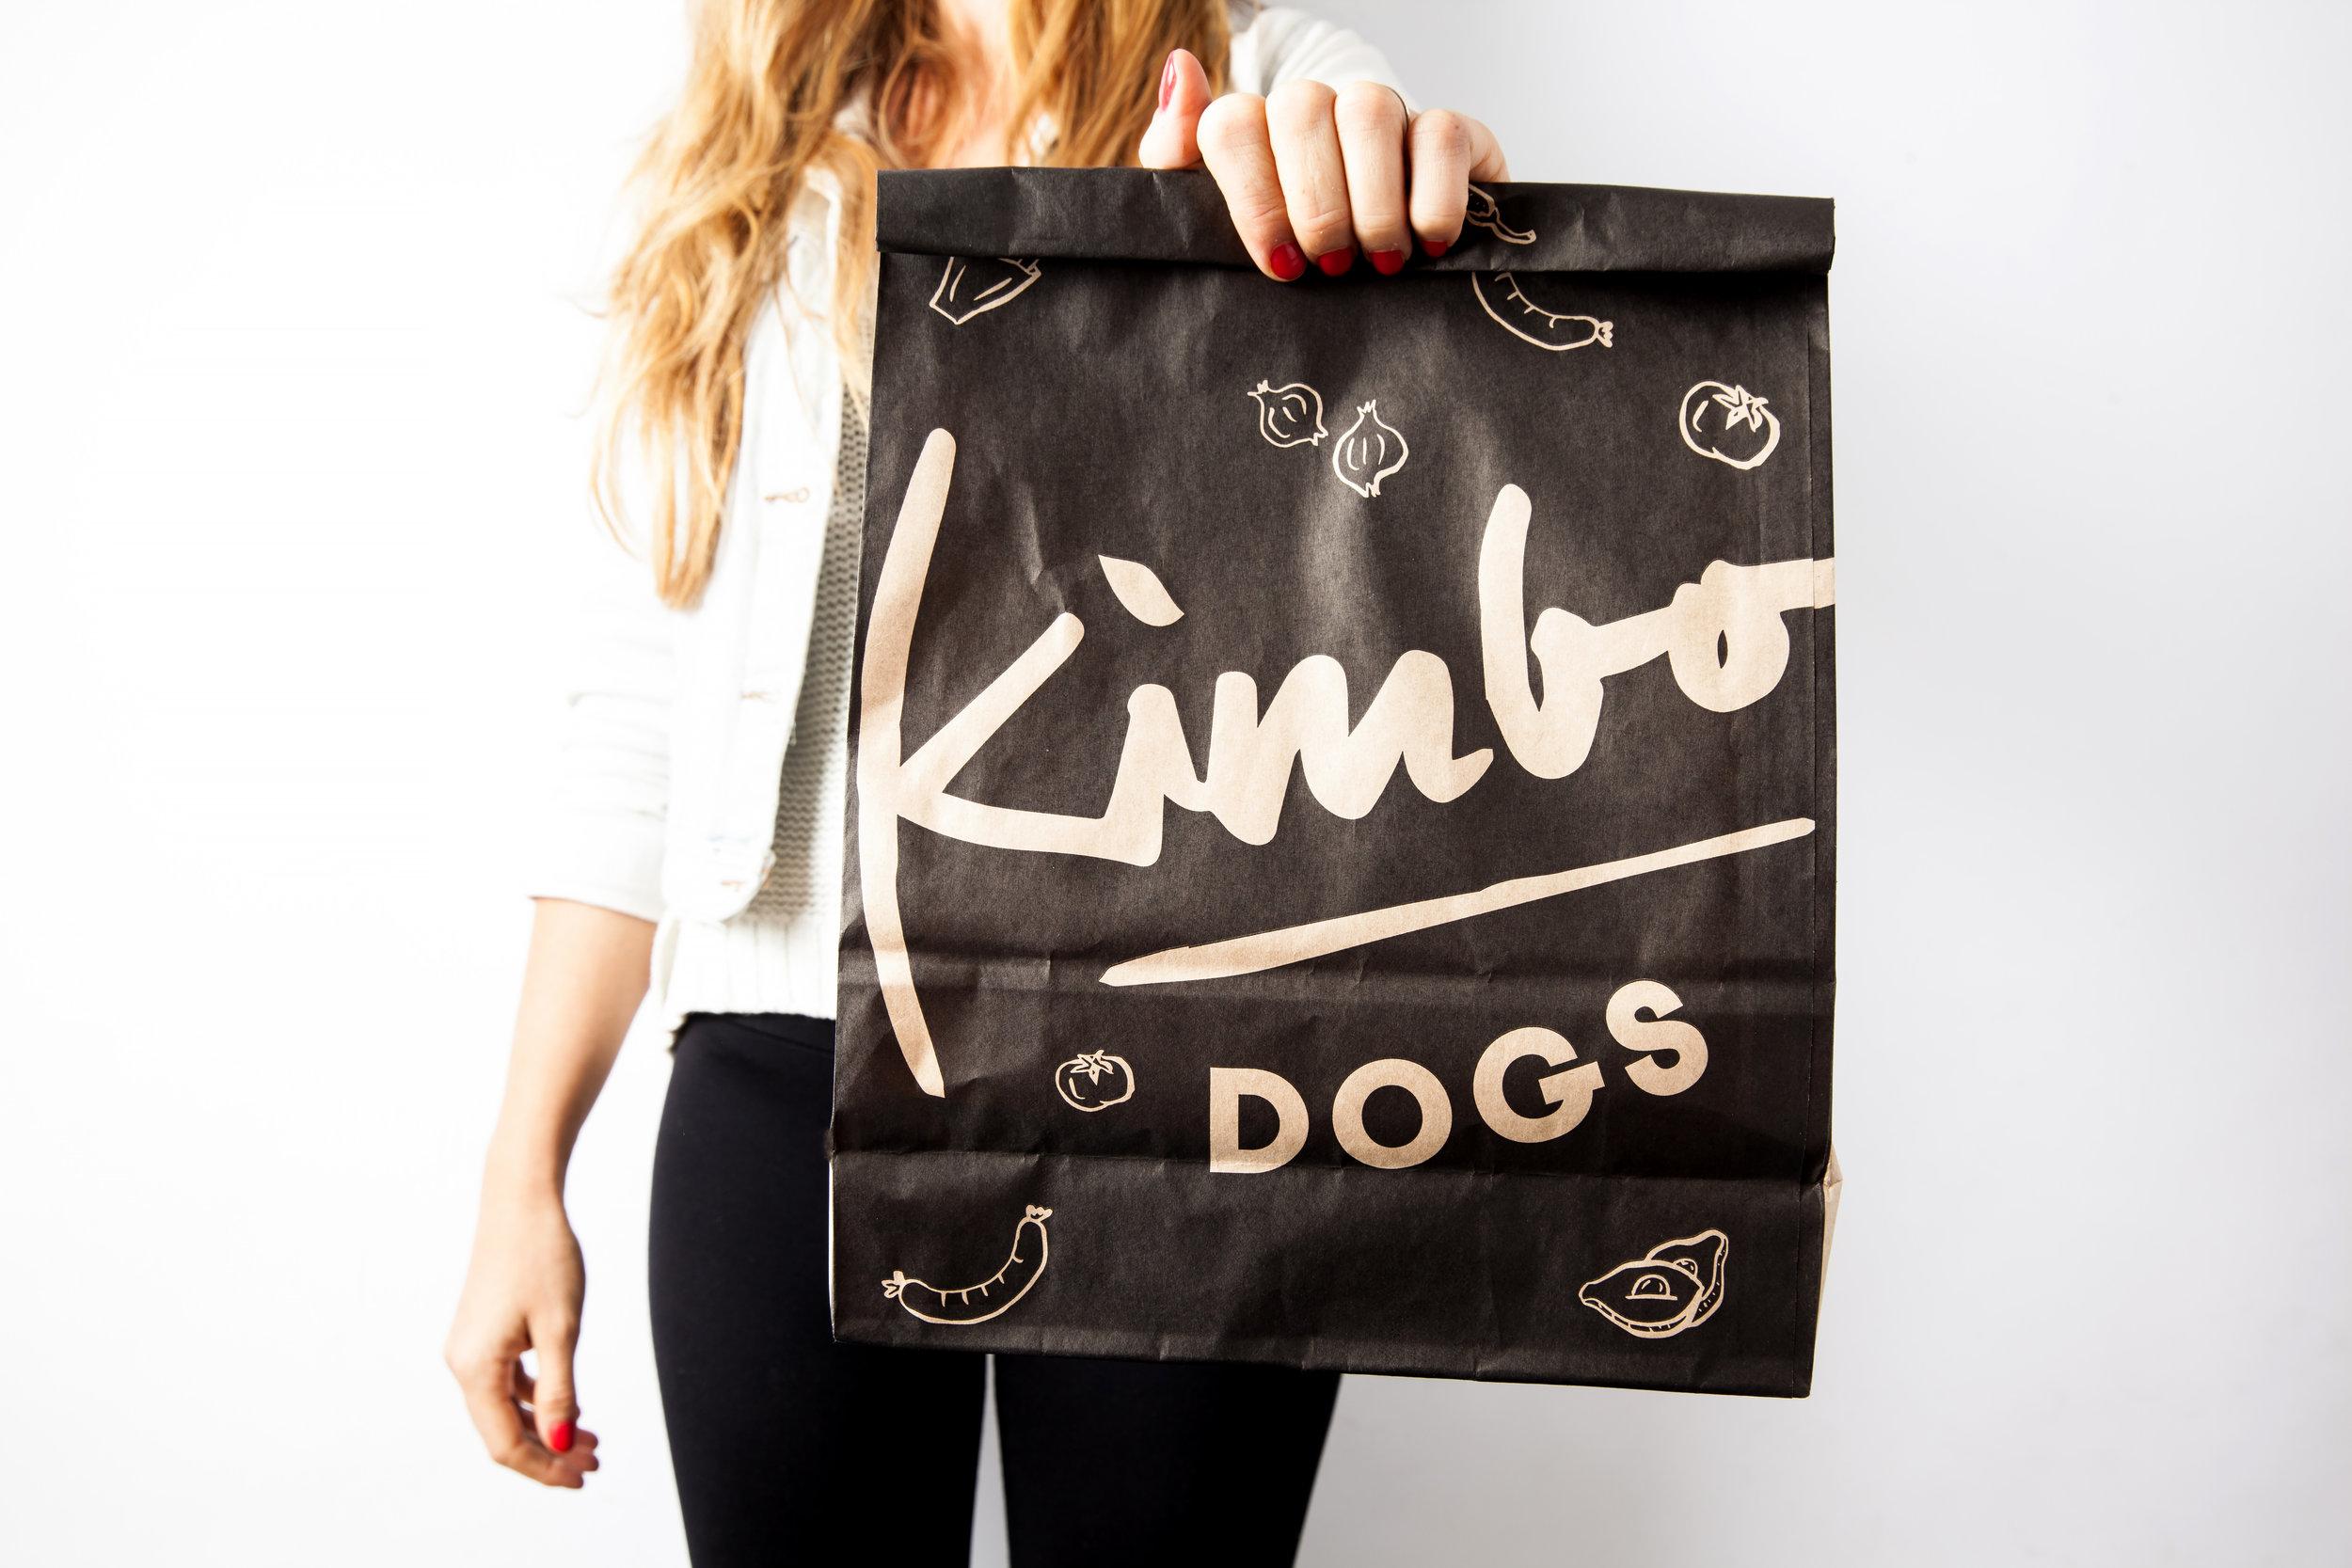 Kimbodogs_33.jpg